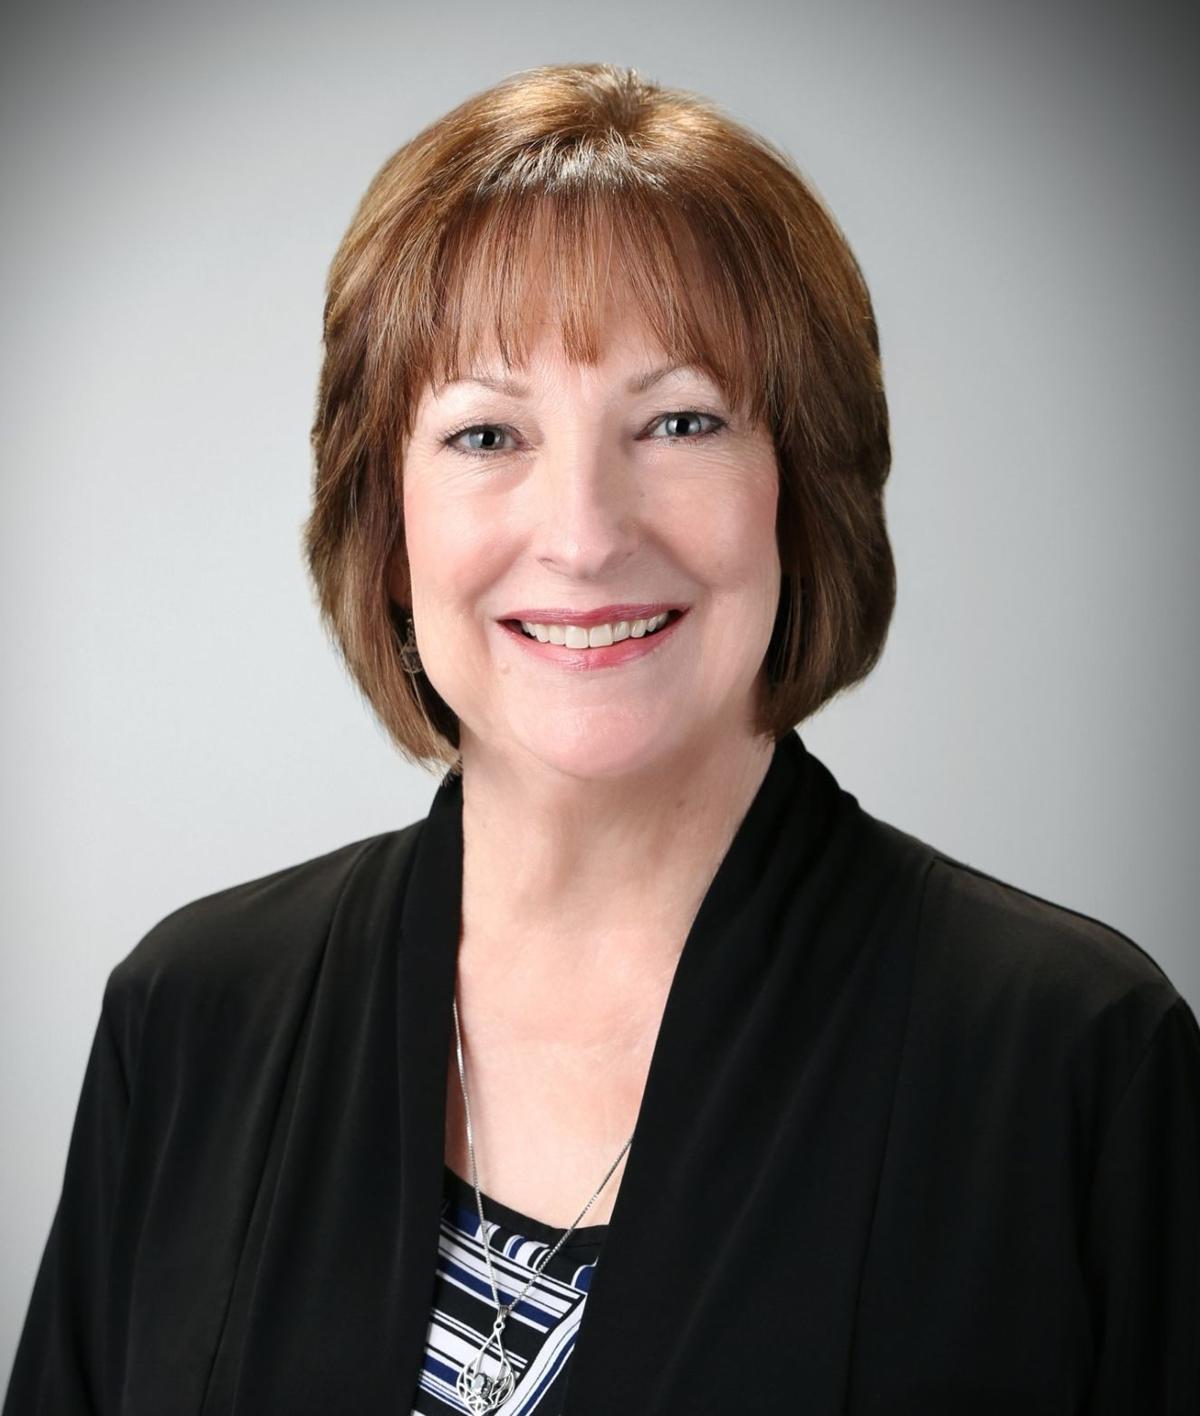 Kathy Birdwell